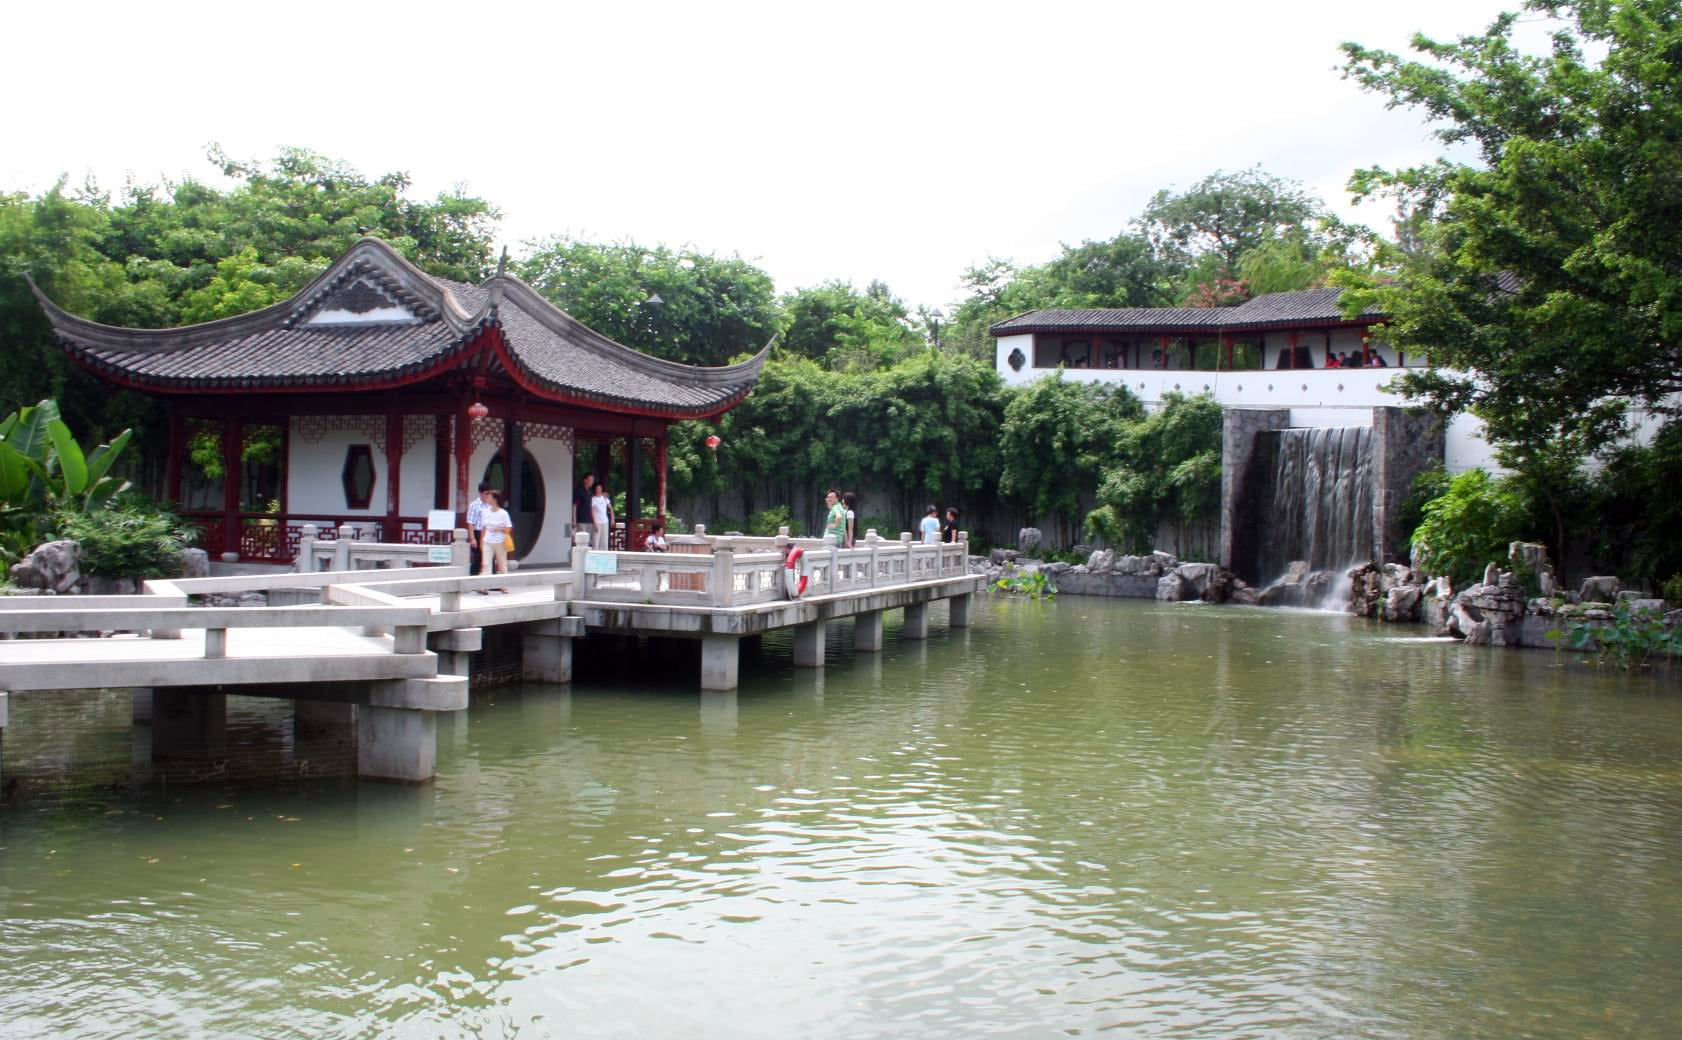 Kowloon Walled City Park (panduanwisata.id)